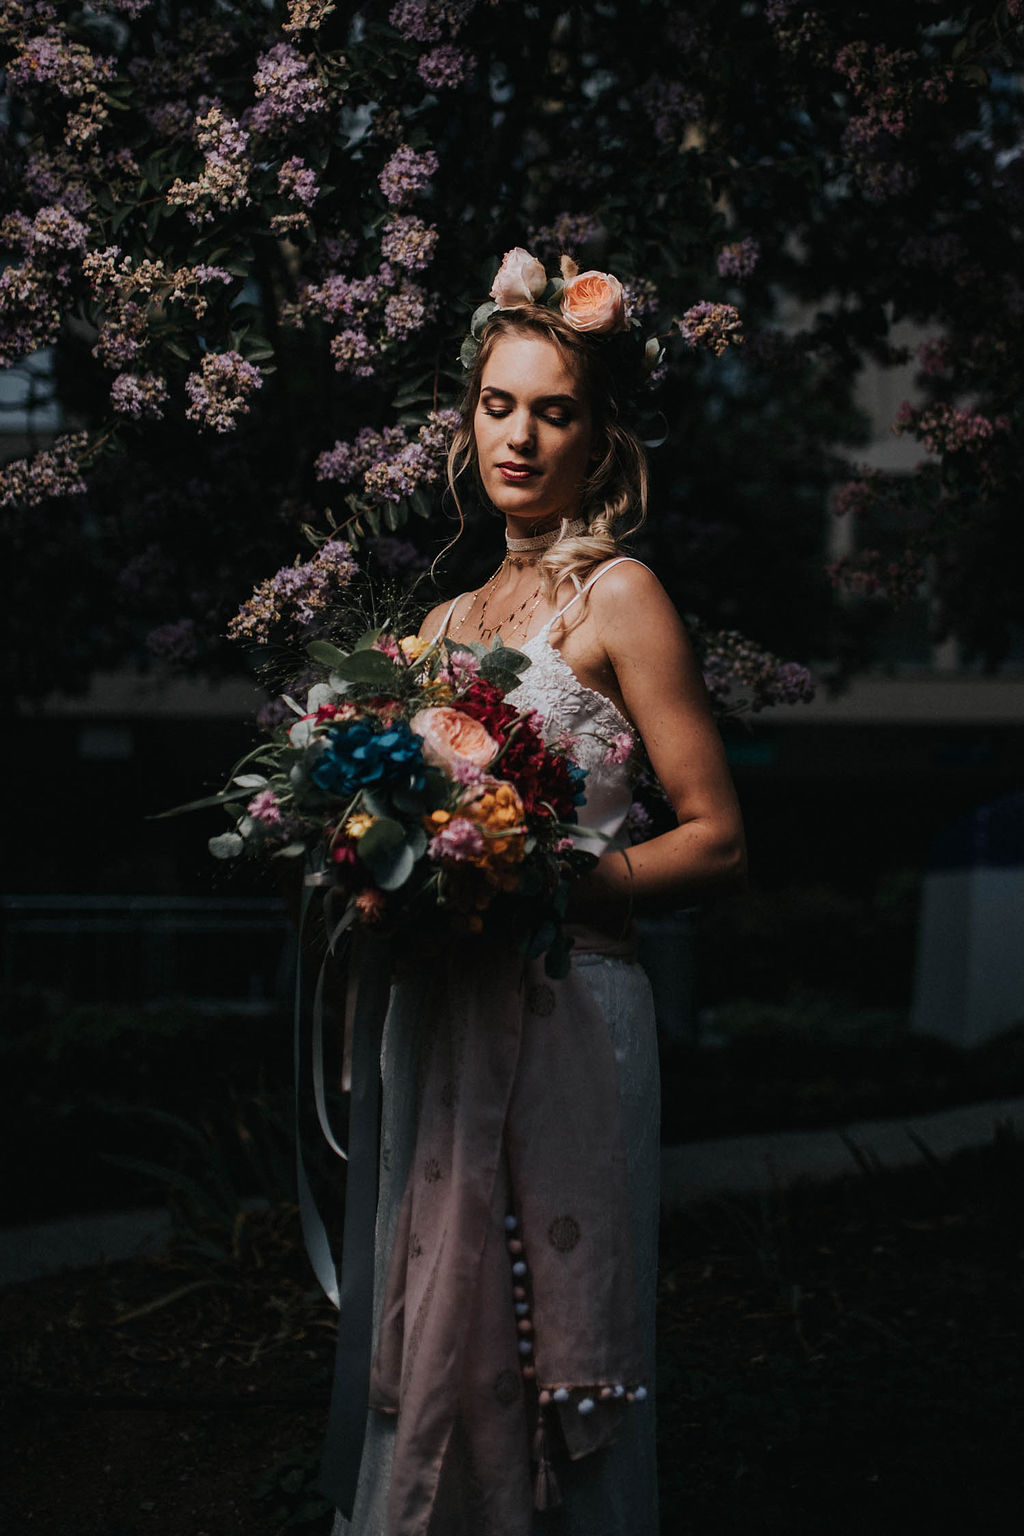 2_20_boheme_couple_4_looks_sidneyonthemoon_photographe_chrisvonmartial_robe_mariee_costume_paris_wedding_web